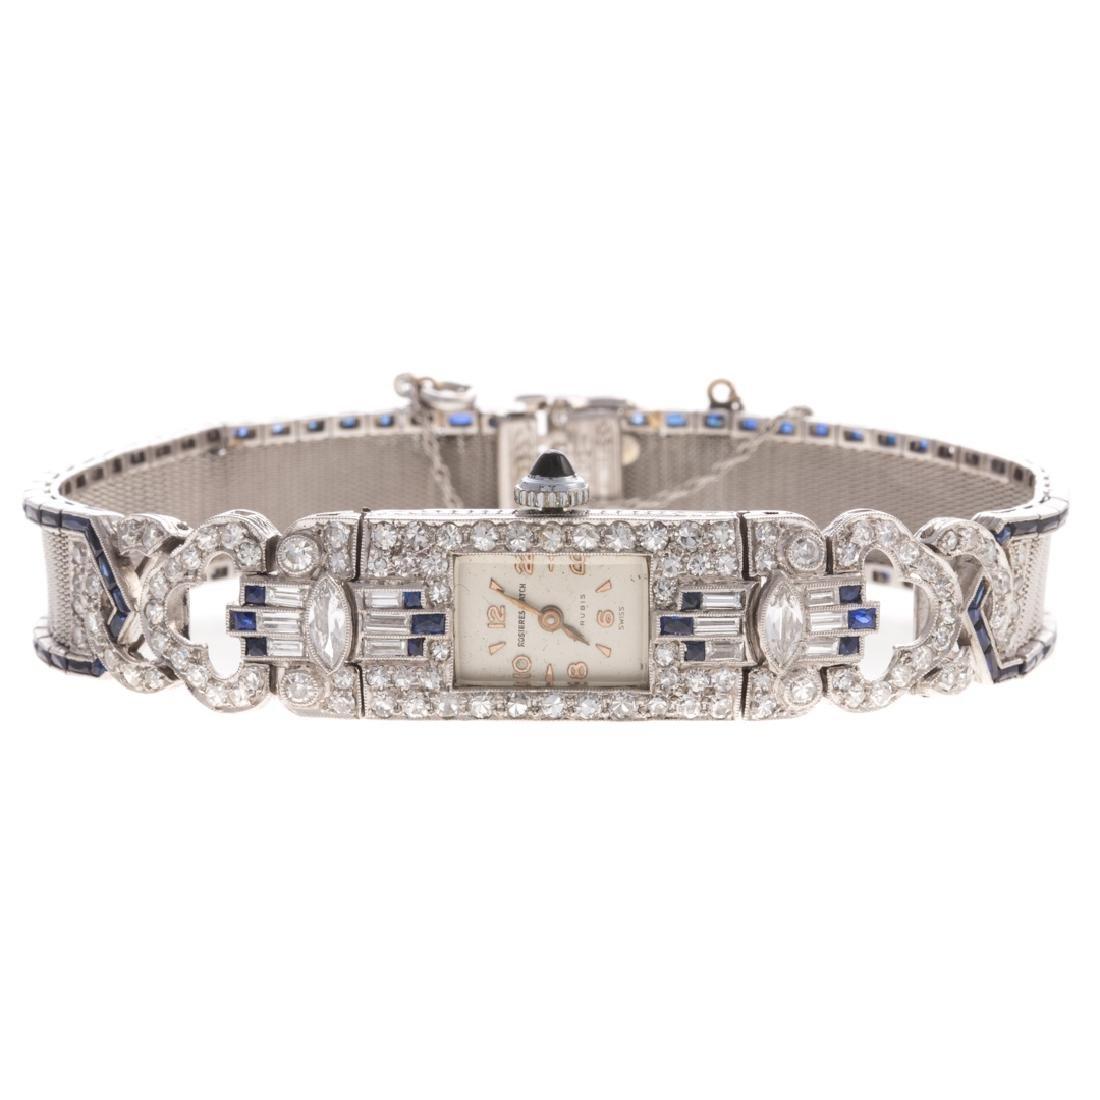 A Platinum Art Deco Diamond & Sapphire Dress Watch